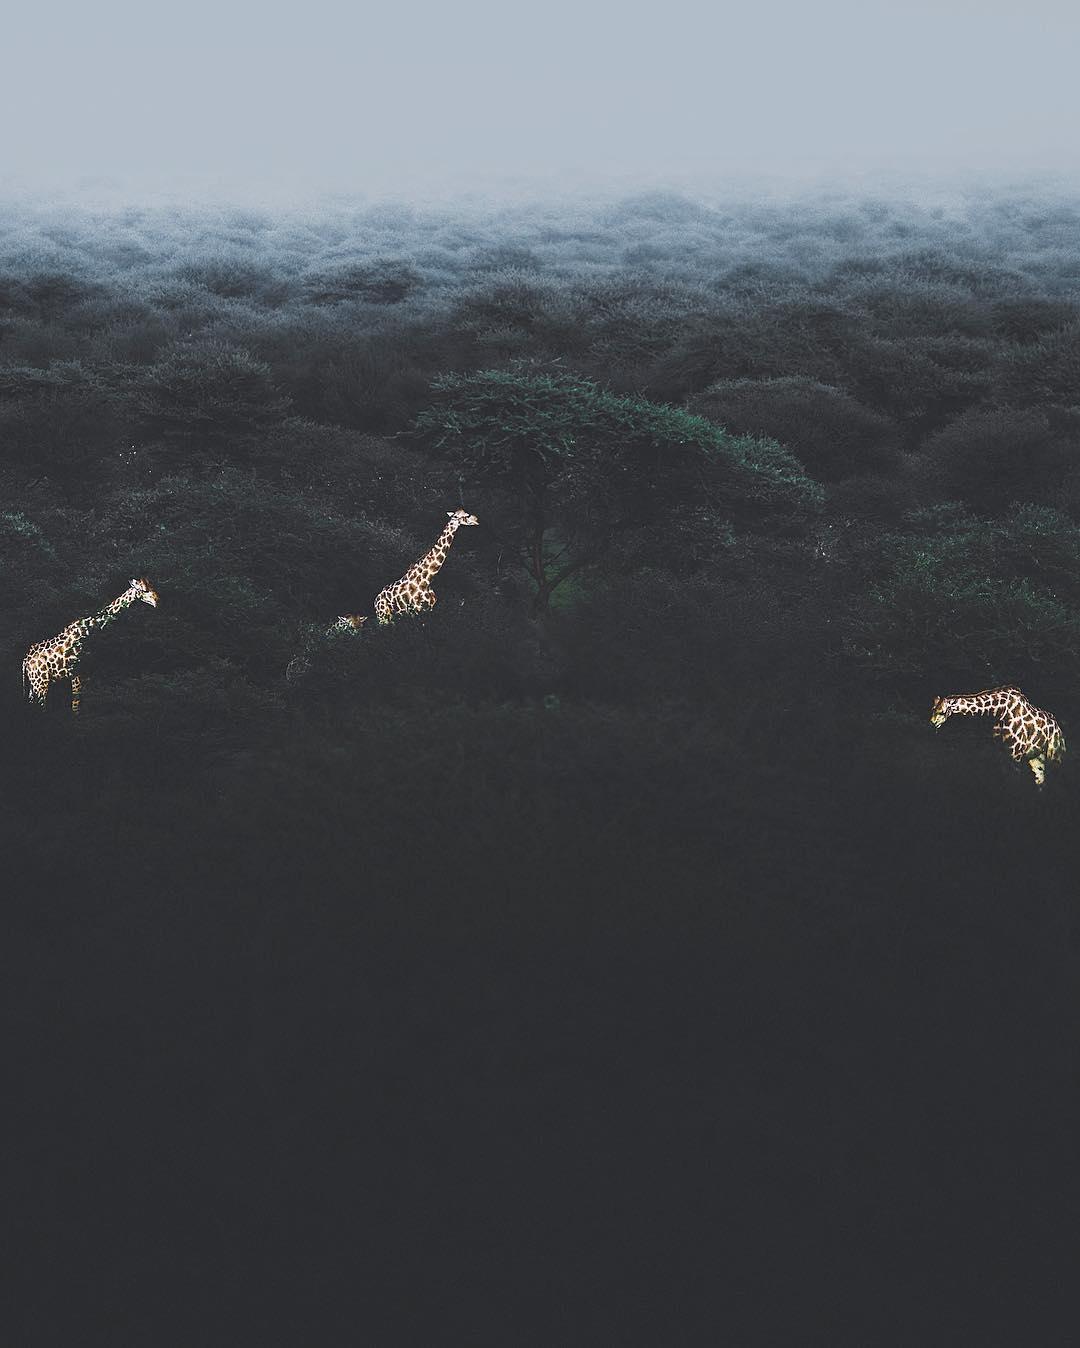 Природа и животные в объективе Донала Джеймса Бойда